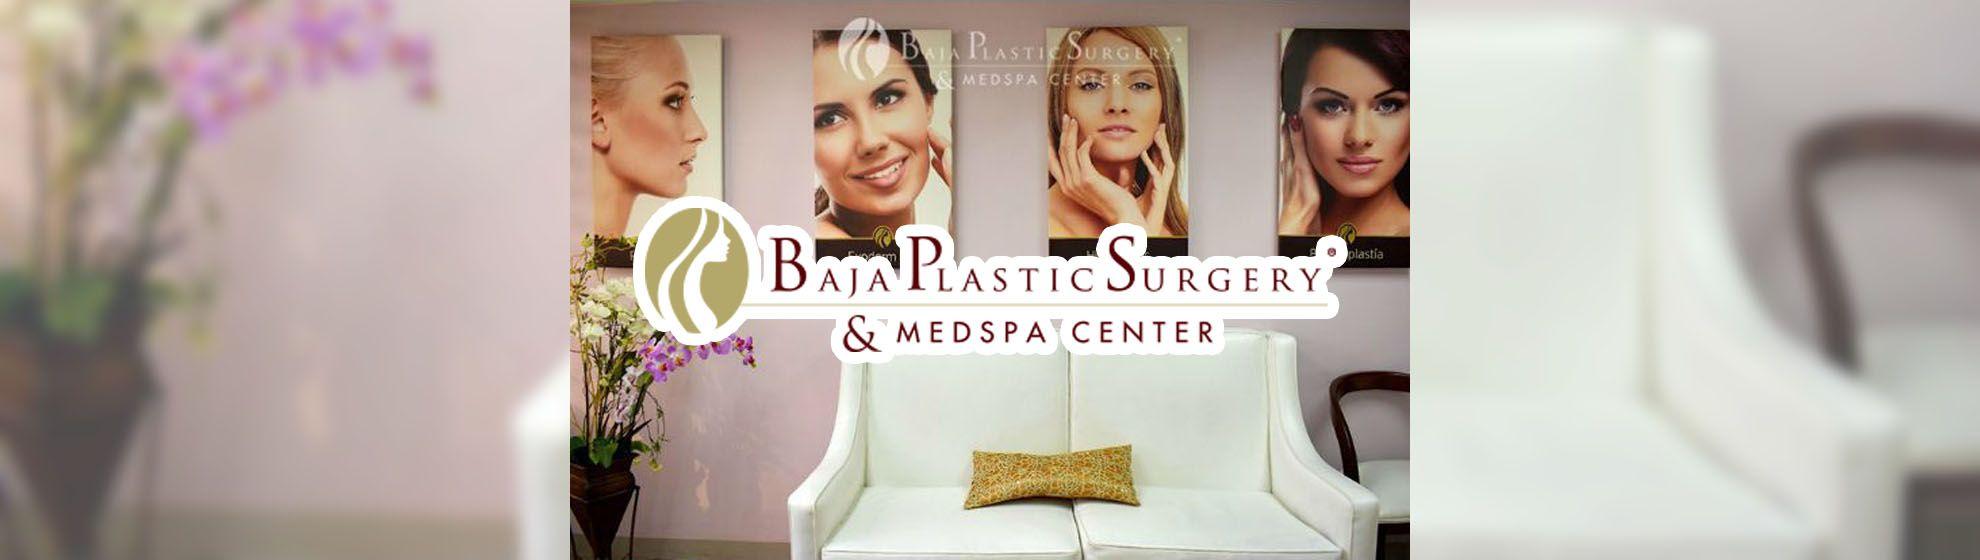 Baja Plastic Surgery